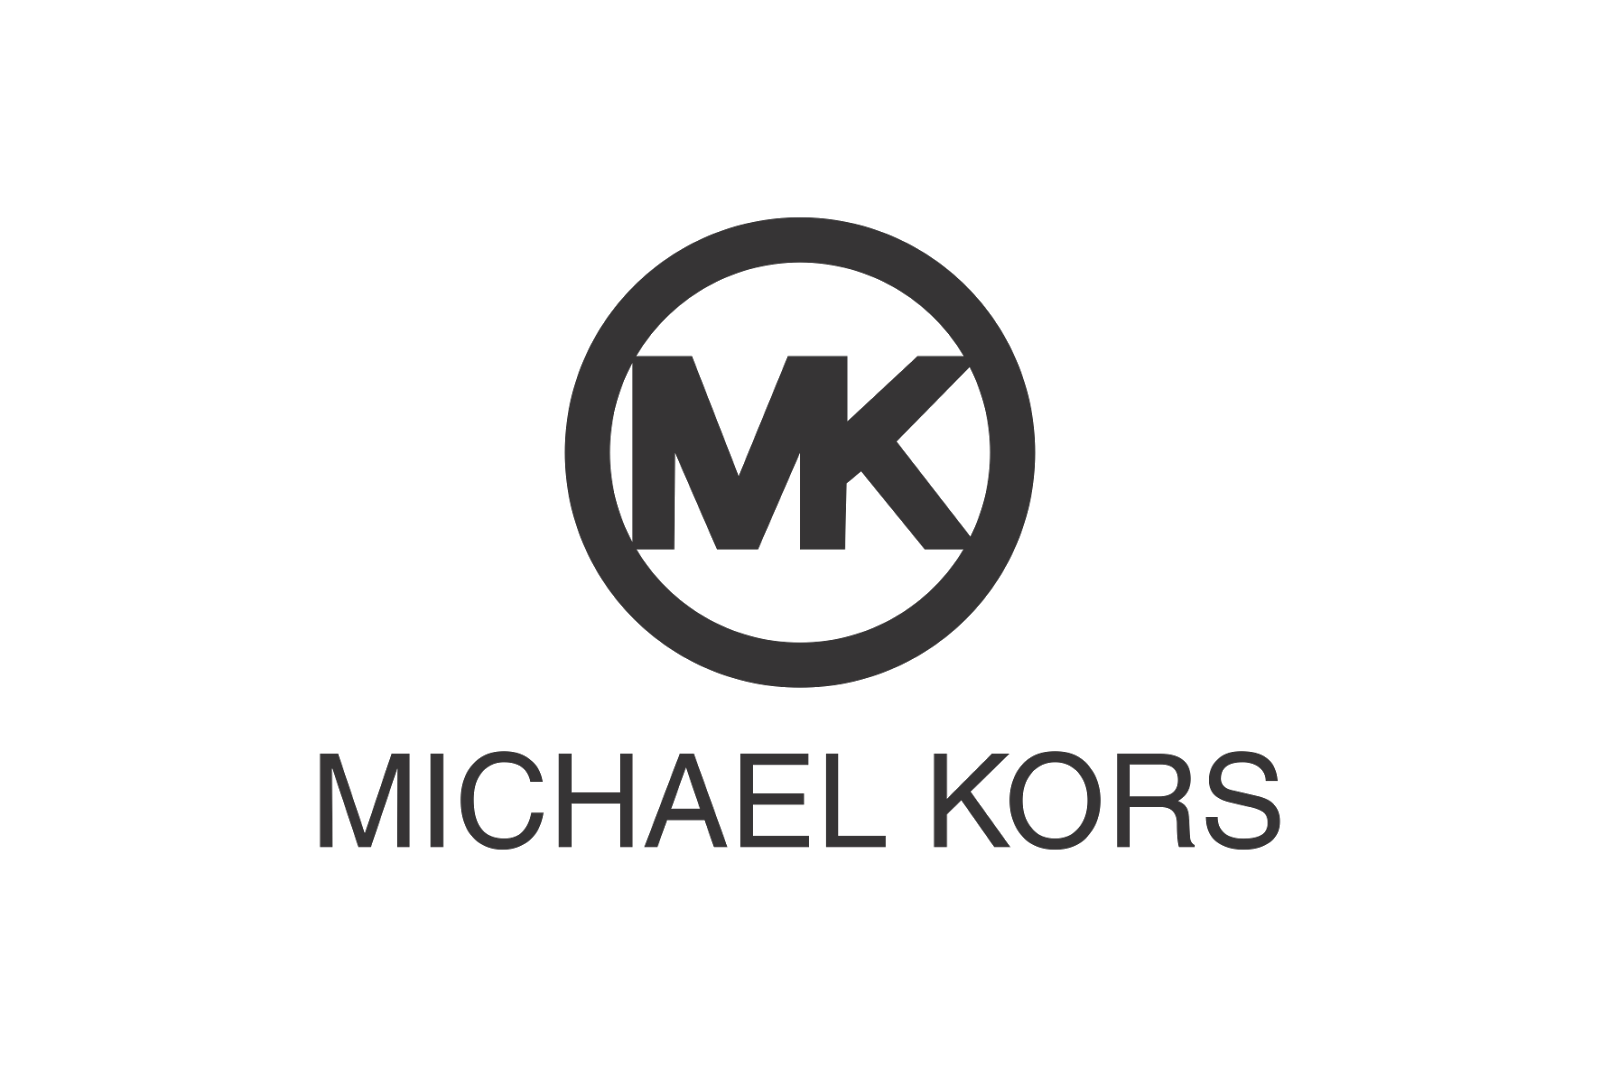 Michael Kors Logo Wallpaper